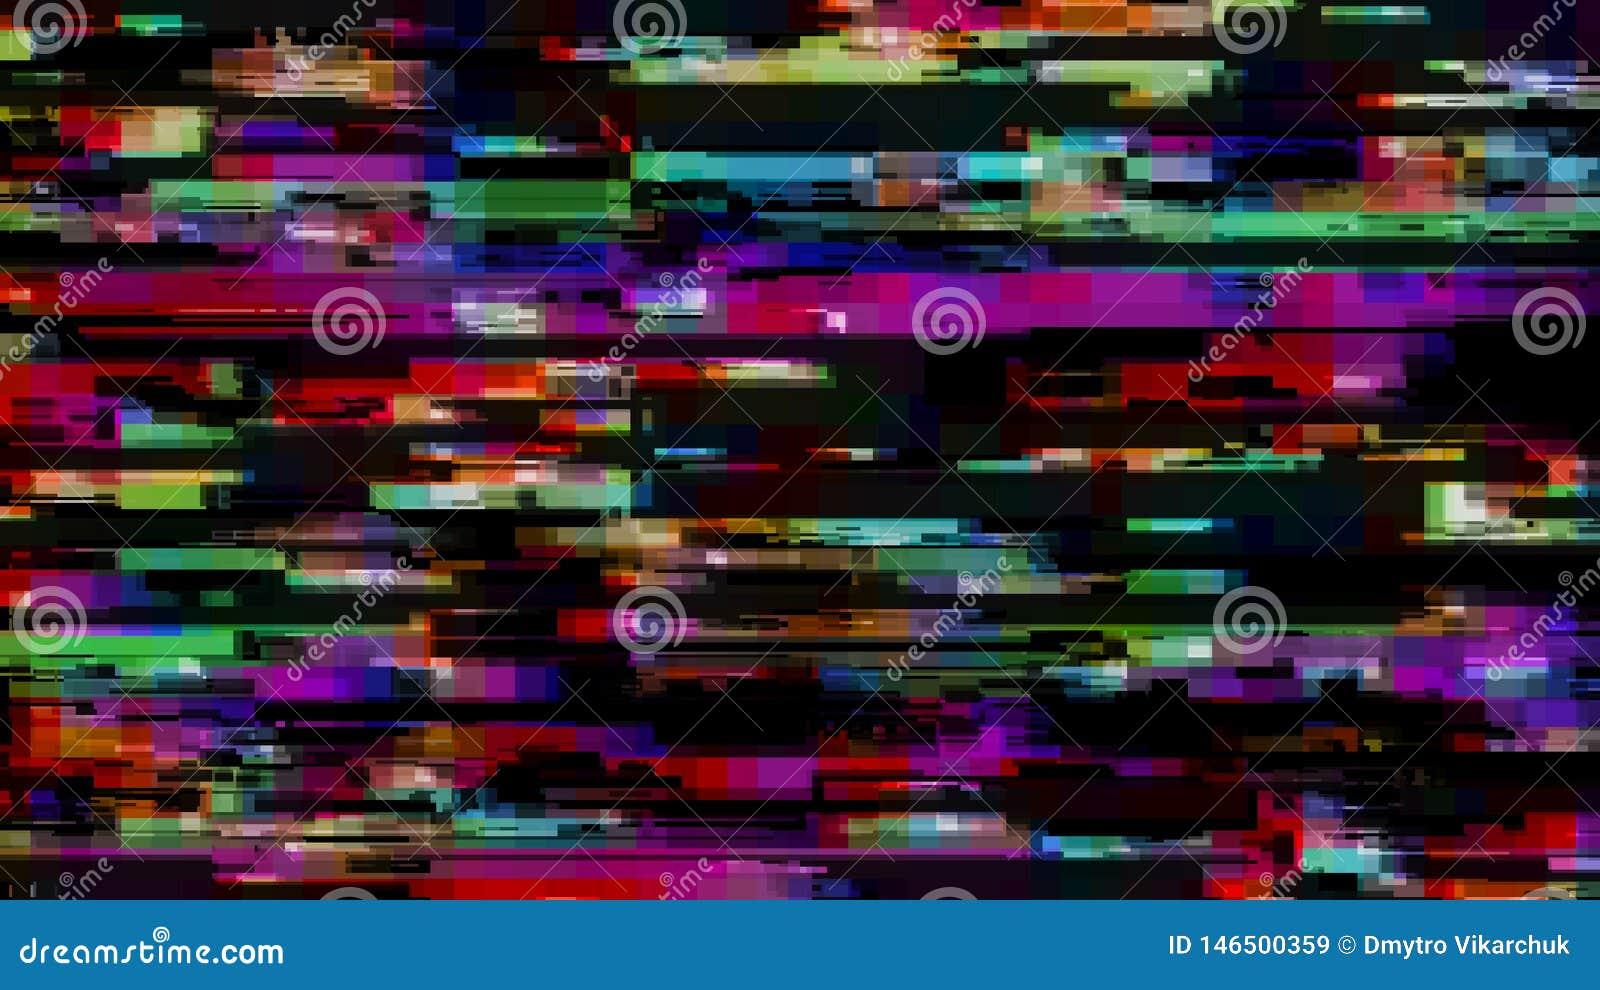 Влияние небольшого затруднения Ошибка экрана компьютера Видео ошибки o r Предпосылка небольшого затруднения